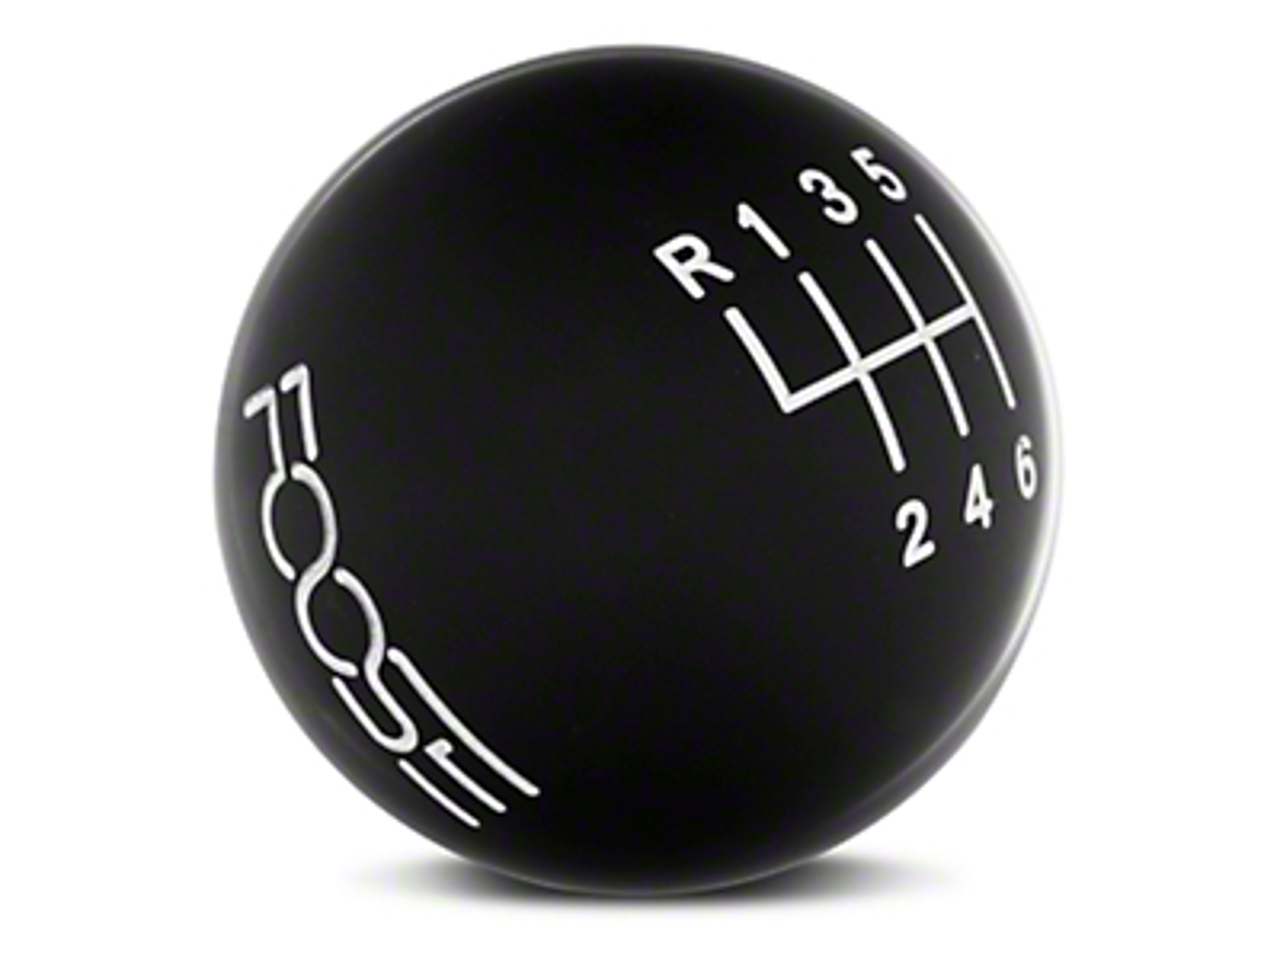 MMD by FOOSE Retro Style 6-Speed Shift Knob w/ FOOSE logo - Black (11-14 GT, V6)